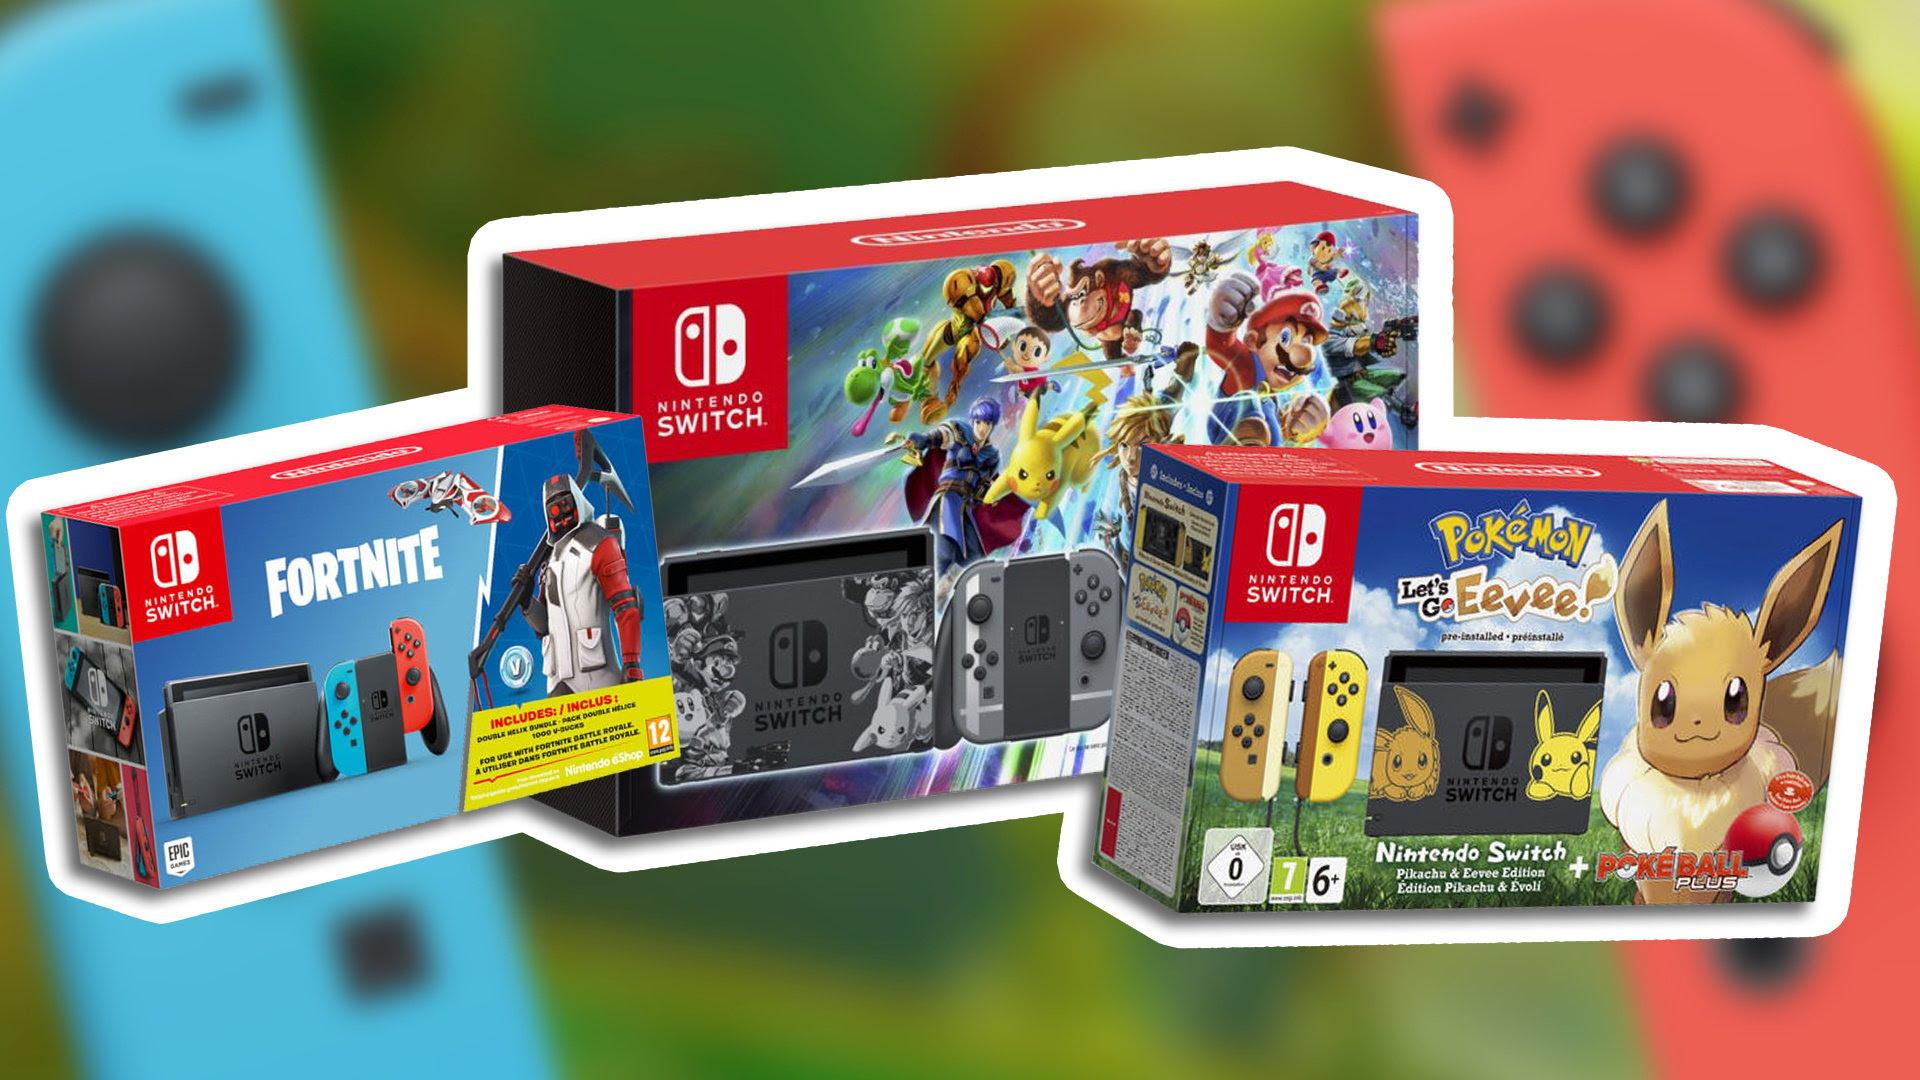 Best Nintendo Switch Hardware Bundle Deals For Christmas ...